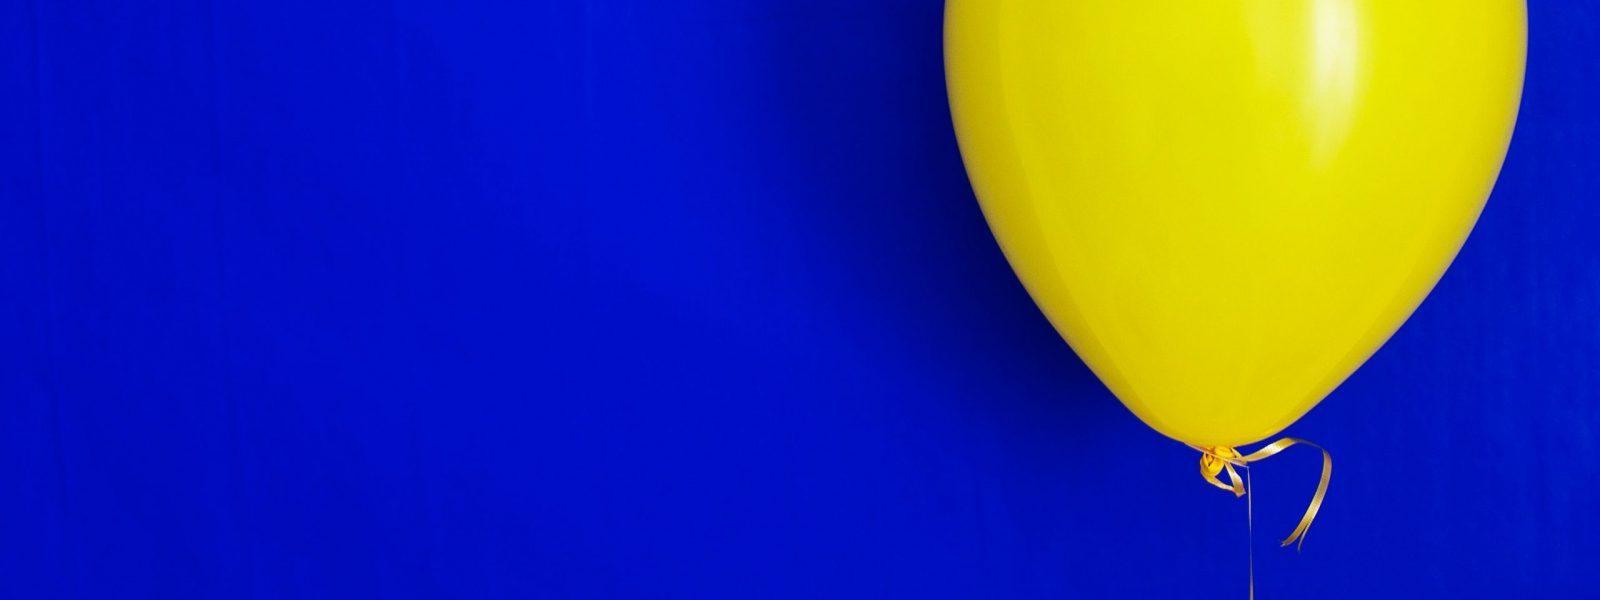 Every-day-sunny-day-home-ballon